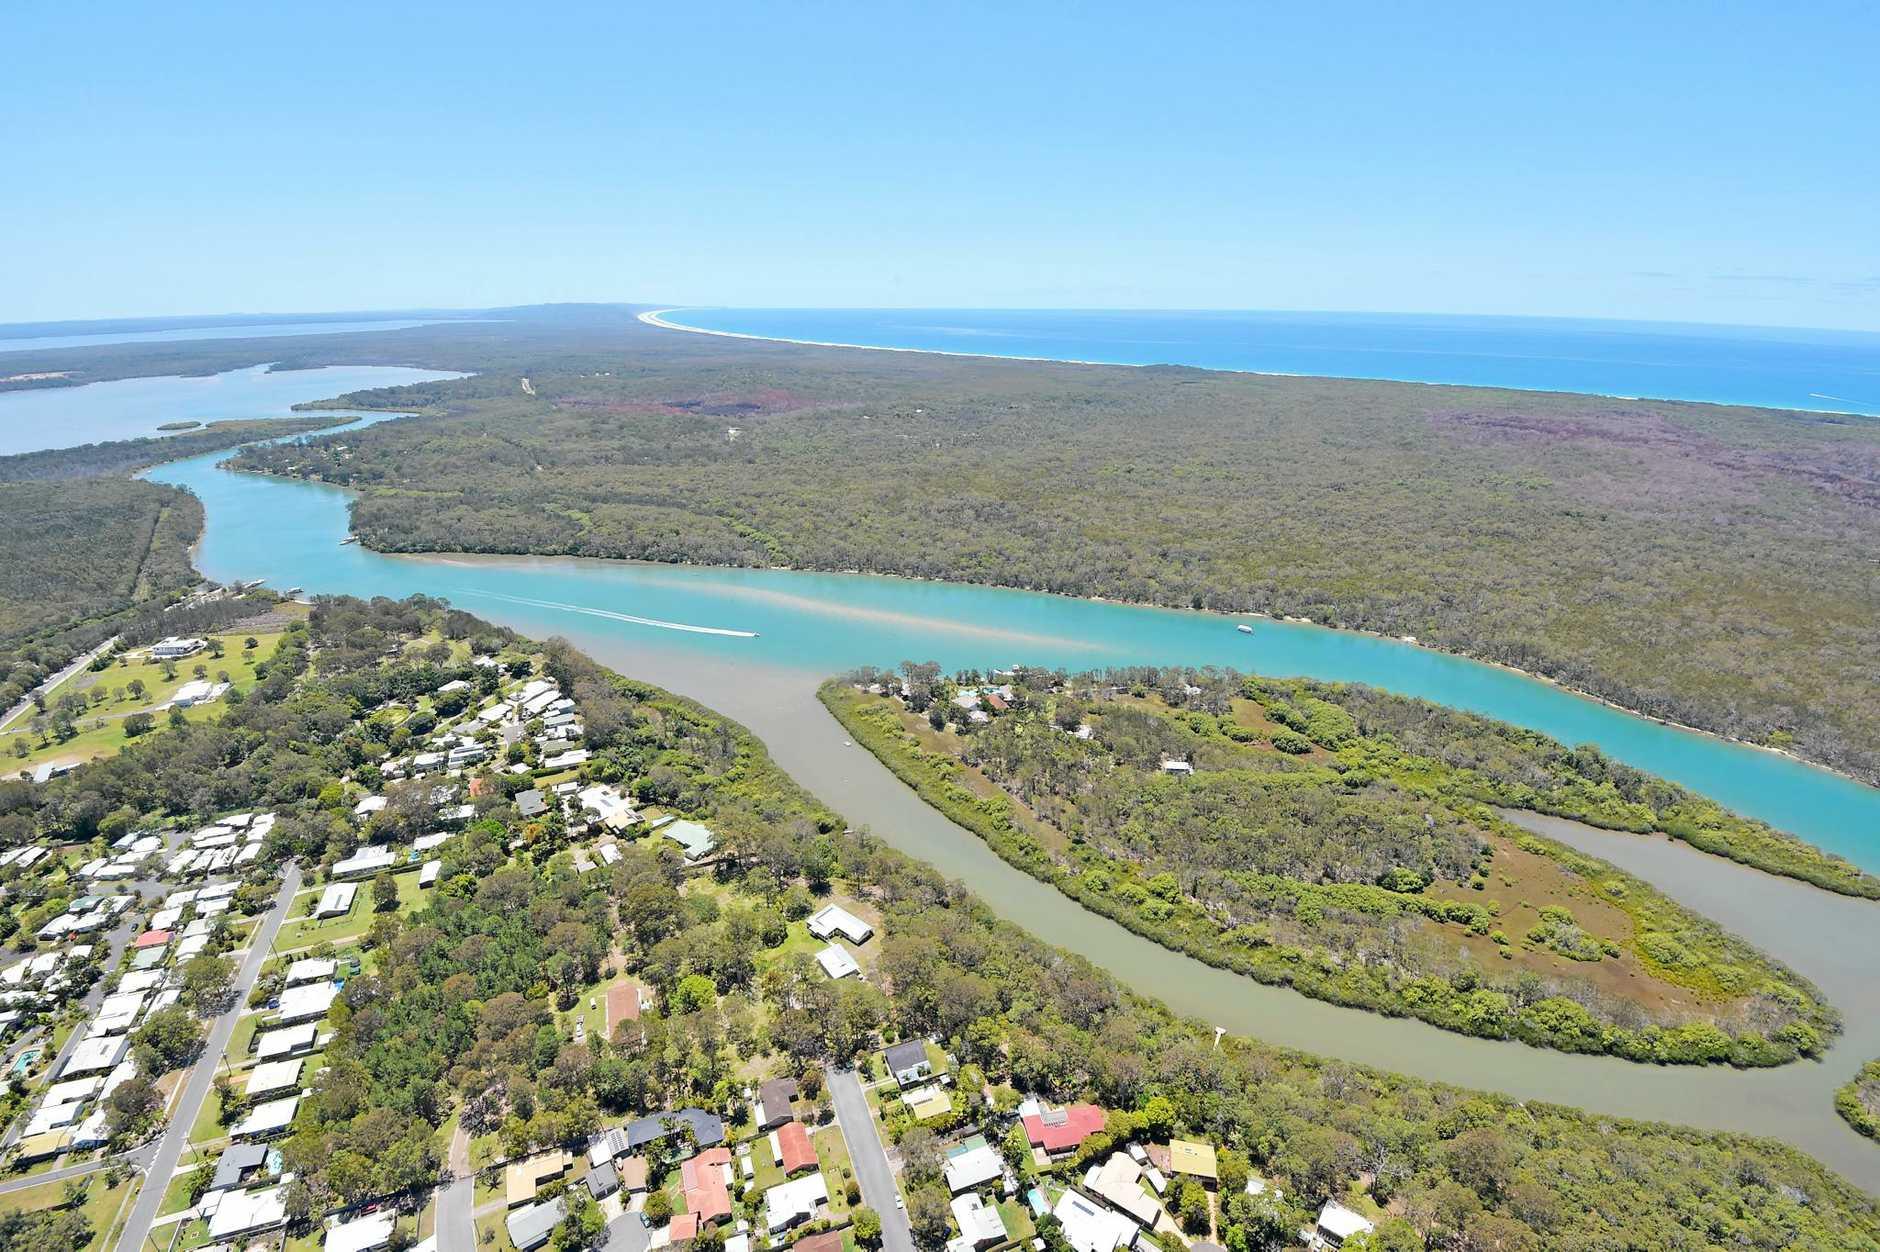 Aerials of the Sunshine Coast taken on Thursday 23 October, 2014 for advertising feature: Makepeace Island Photo: Brett Wortman / Sunshine Coast Daily